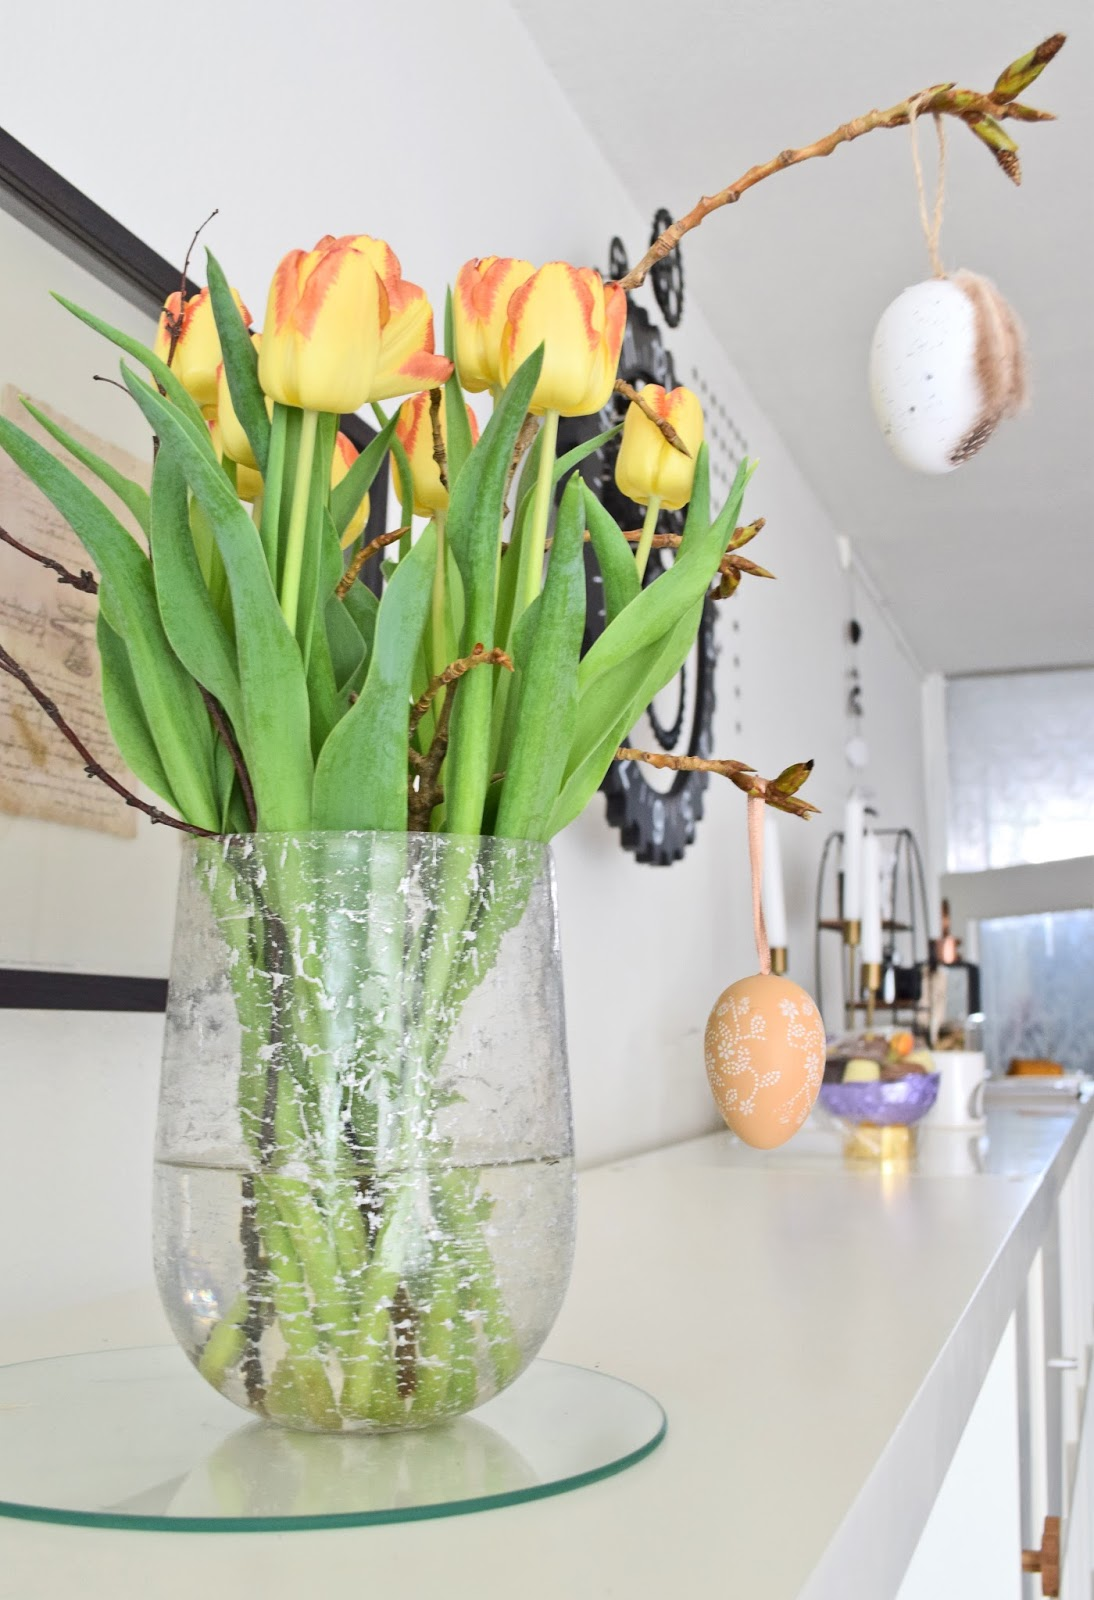 Wielkanocne Kwiaty